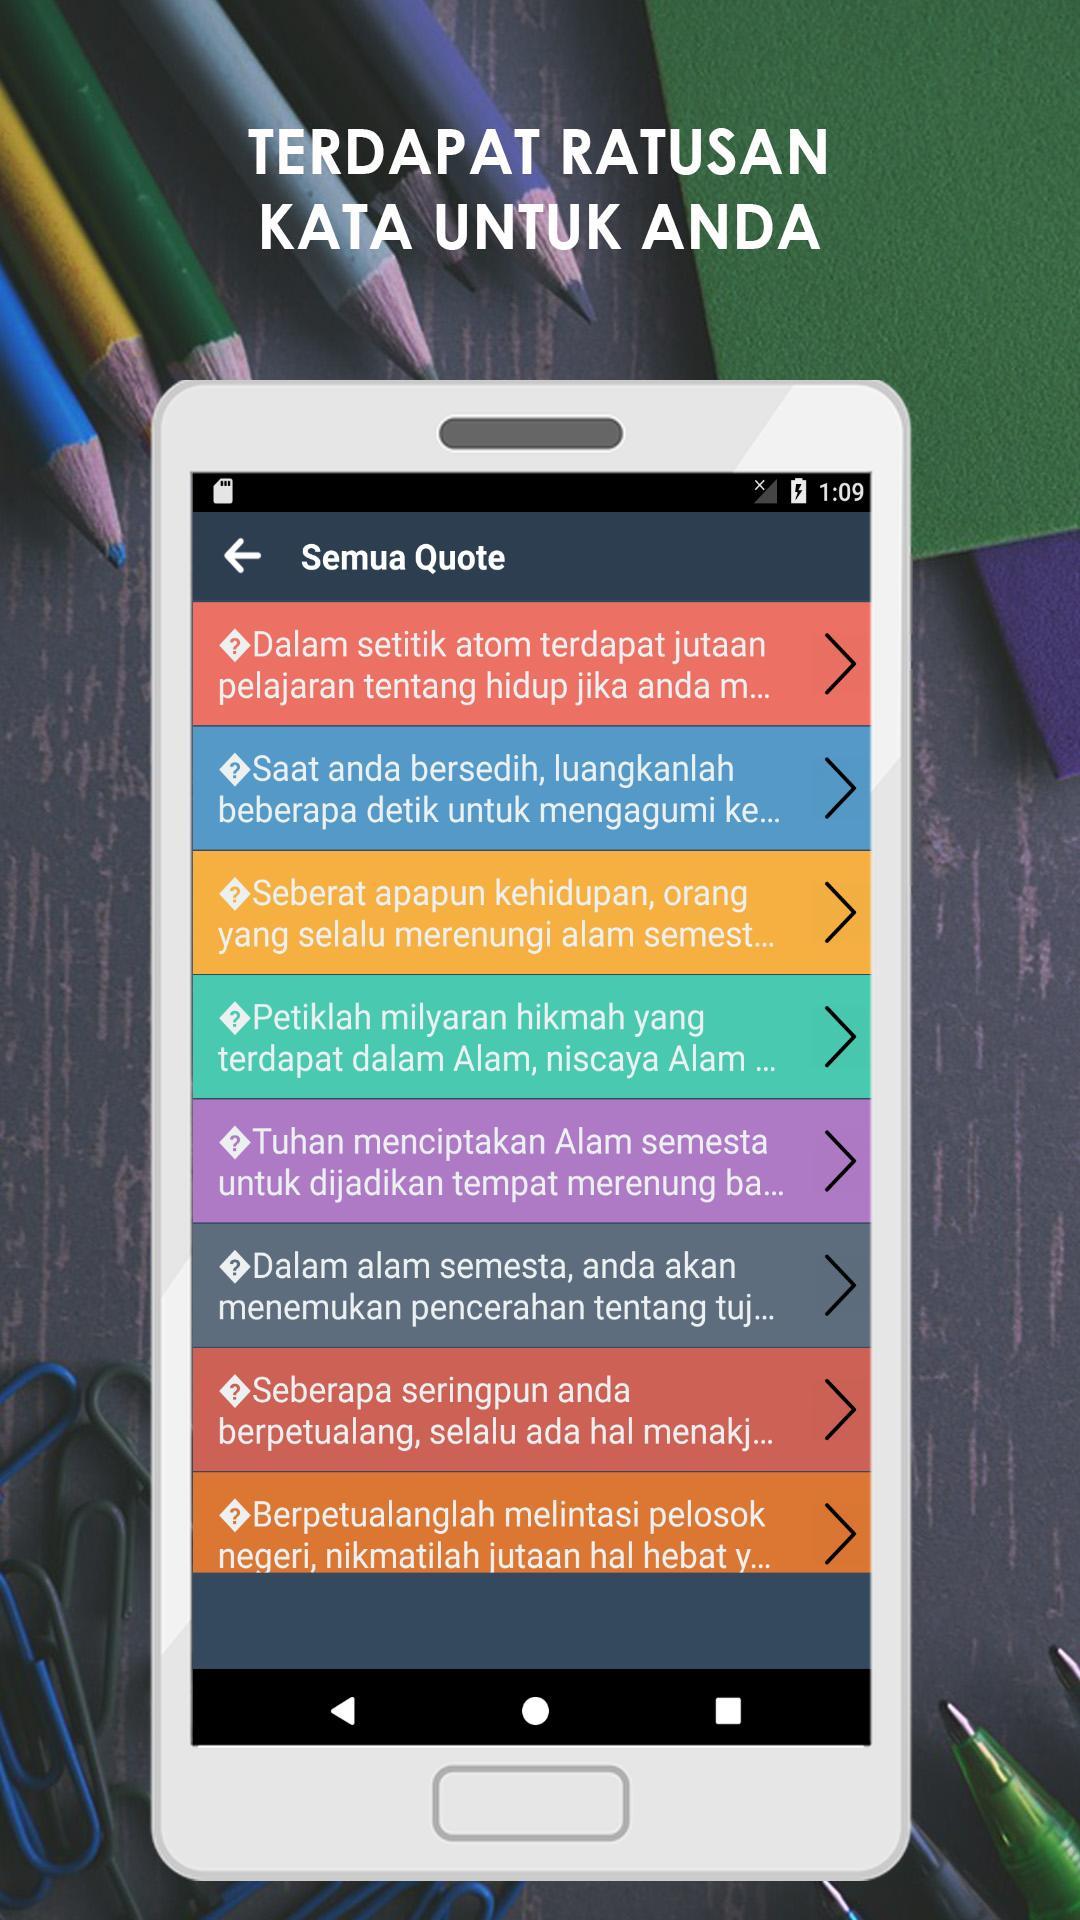 Kumpulan Kata Alam Semesta Lengkap Für Android Apk